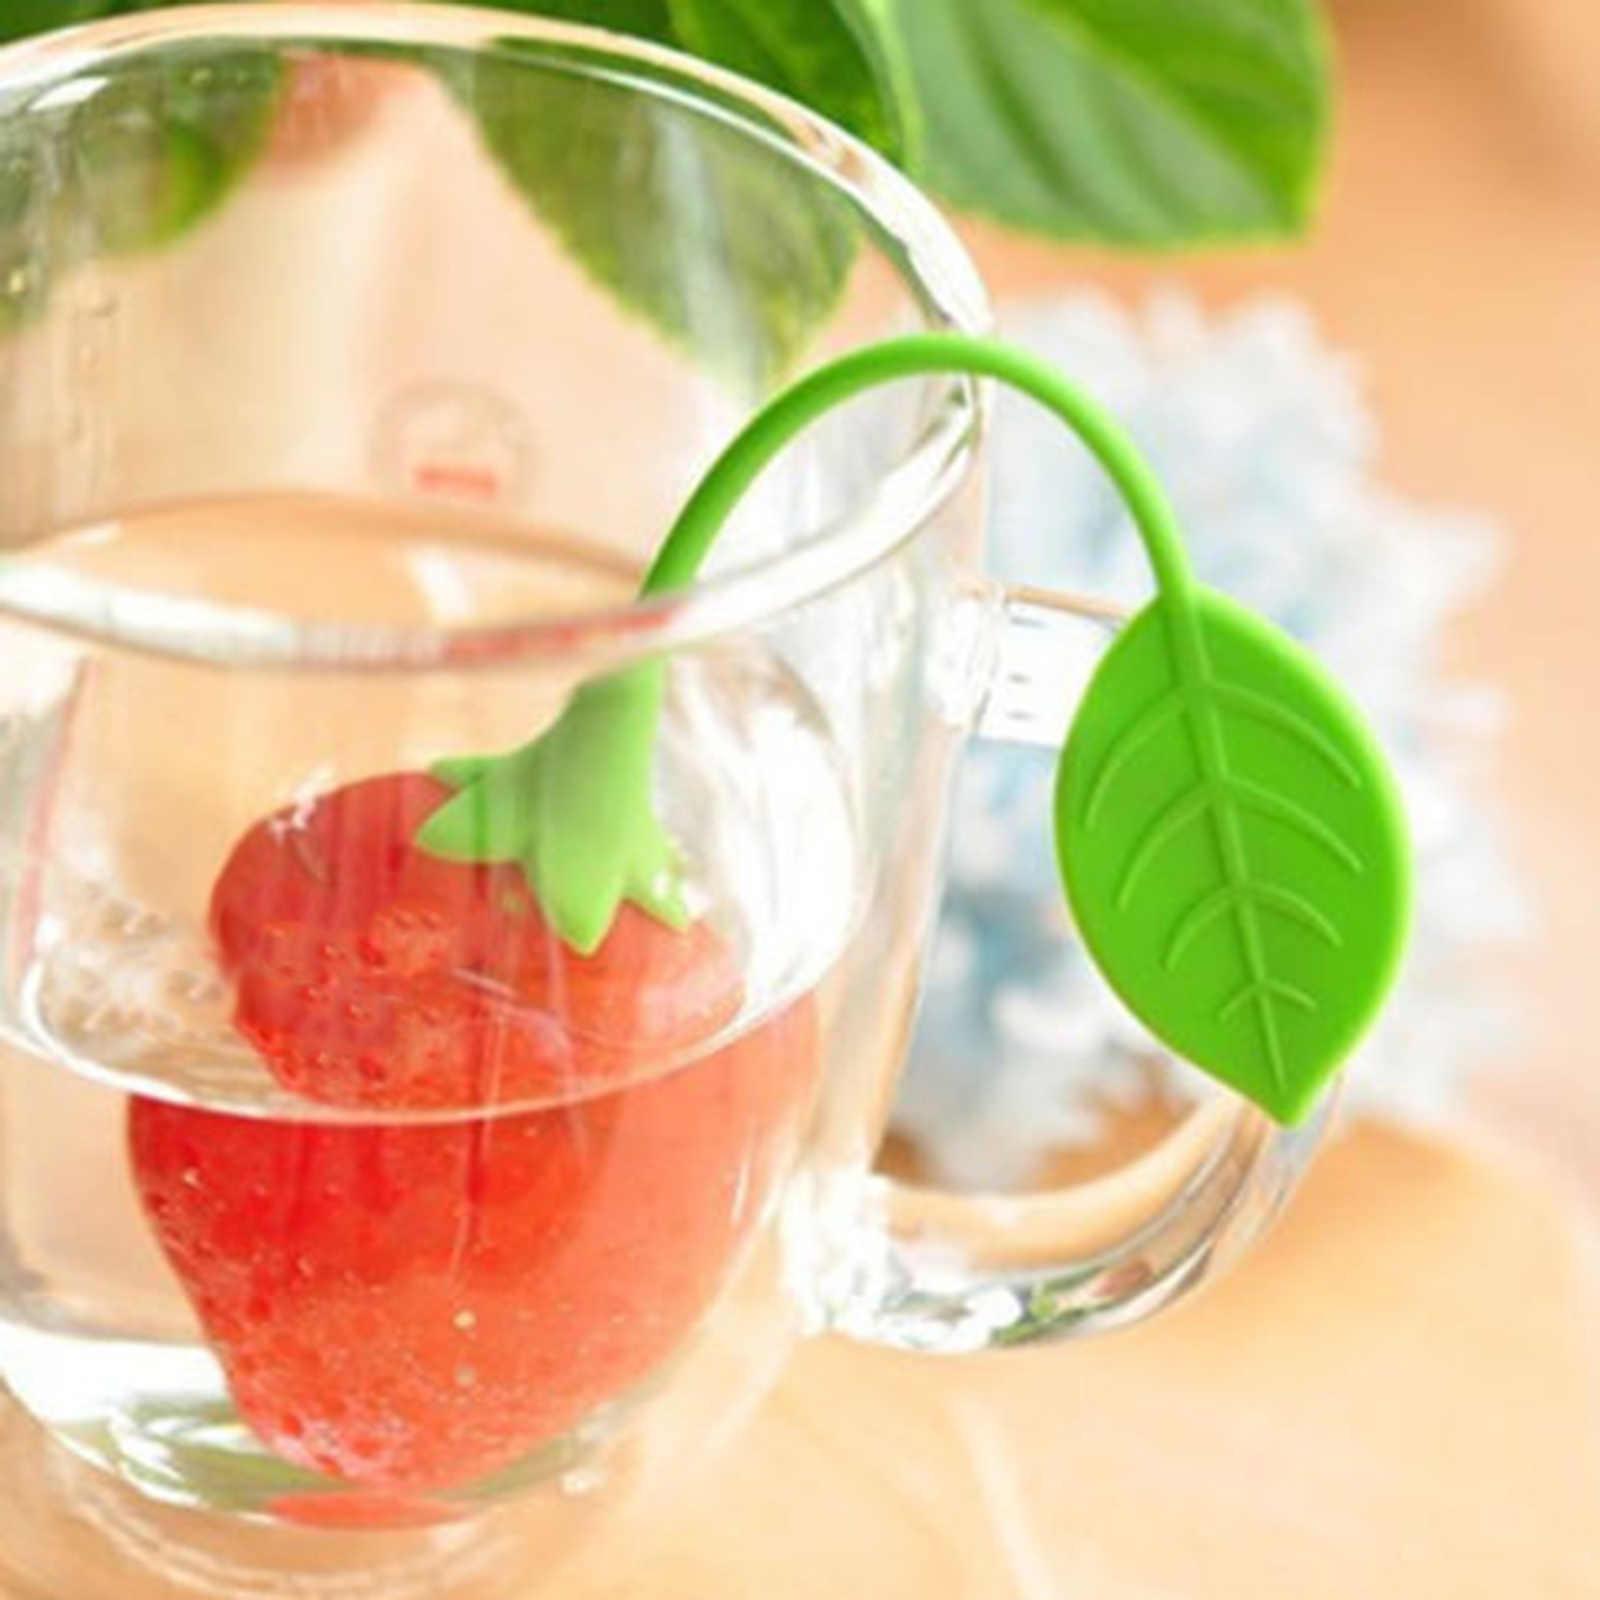 Silikon Gummi tee-ei Tee Sieb Erdbeere Zitrone Design Lose Tee Blatt Sieb Tasche Kräutergewürzfilter Filter Werkzeuge